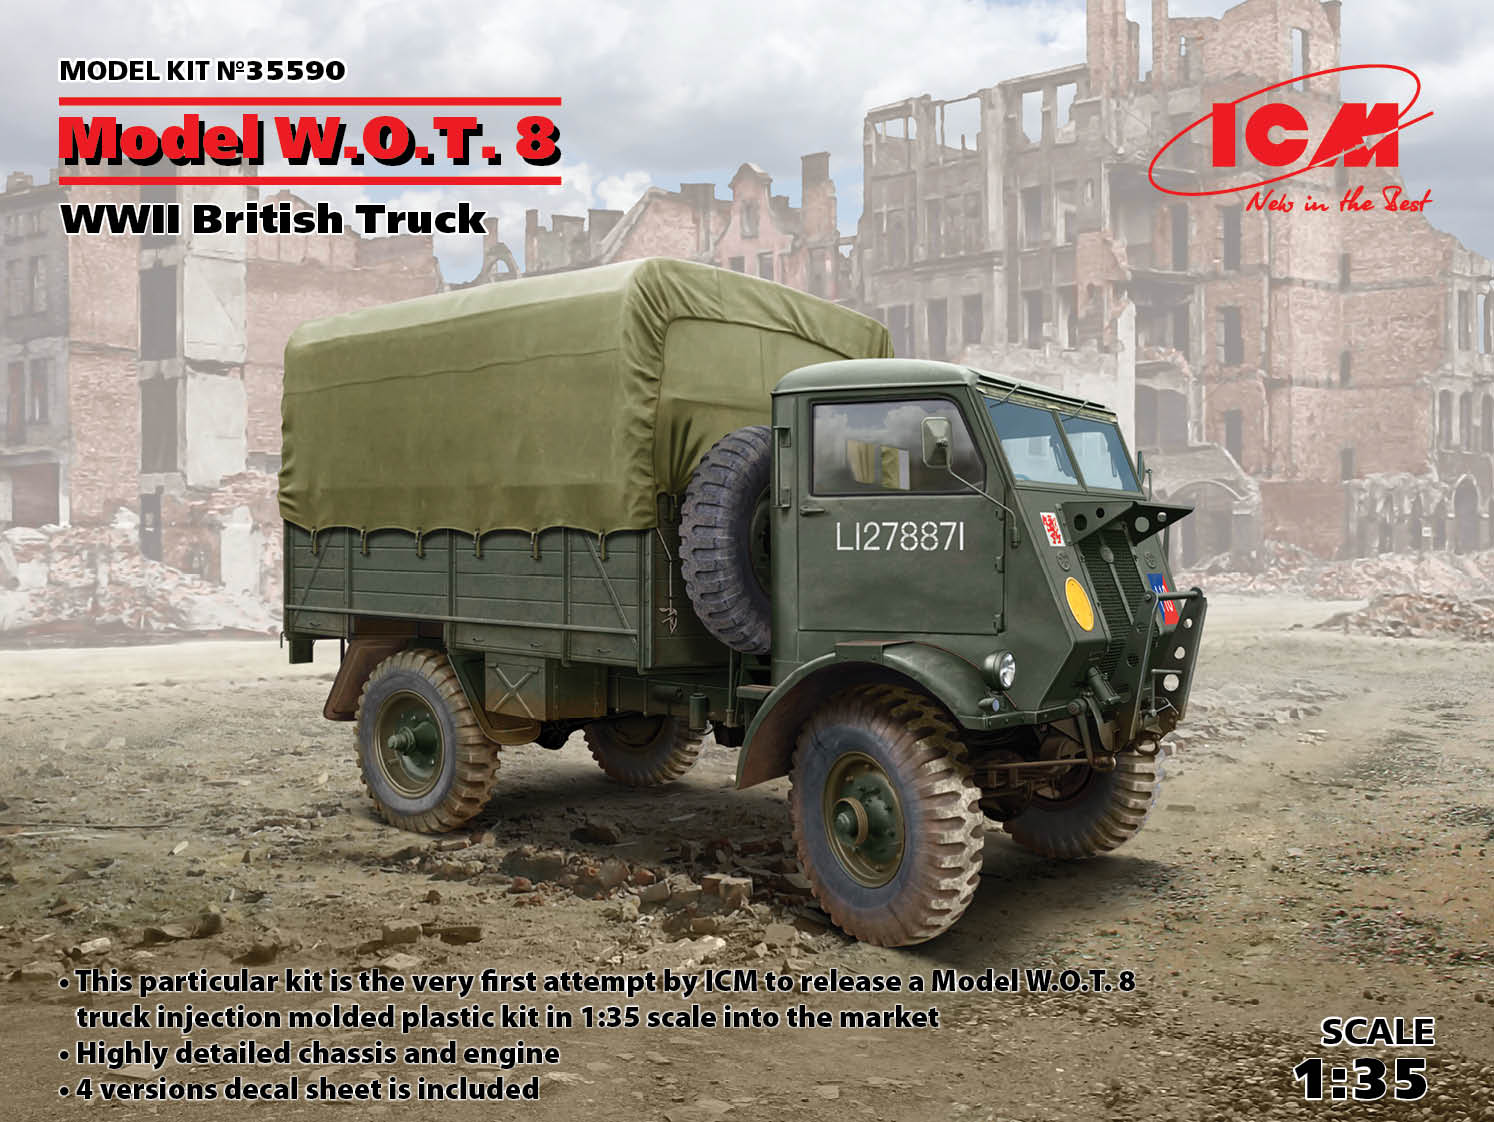 ICM Model W.O.T. 8, WWII British Truck